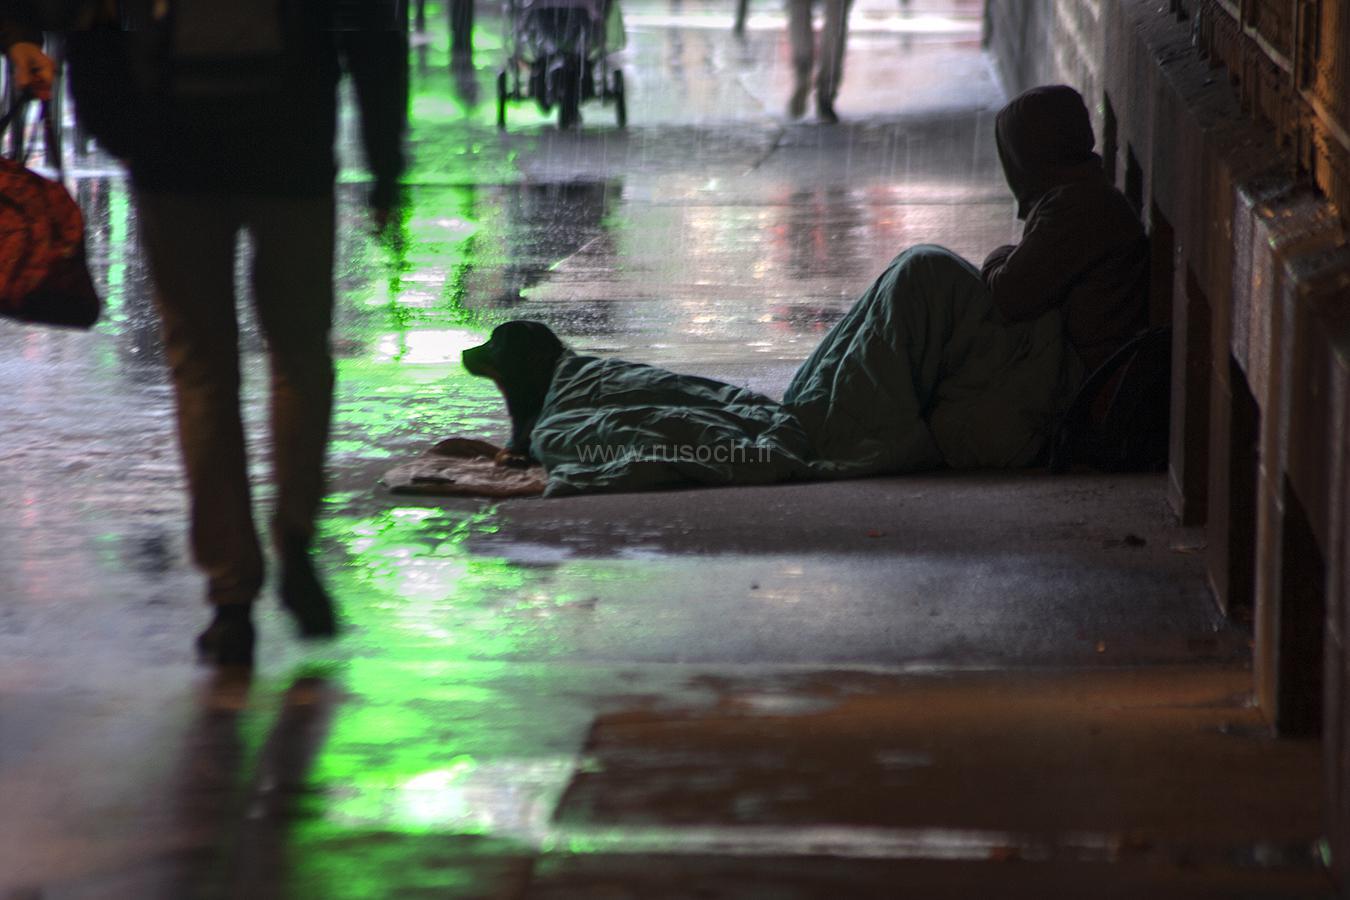 Жители XVI округа Парижа против бездомных и городской мэрии | Les habitants du XVIe arrondissement de Paris s'opposent à la mairie et aux SDF